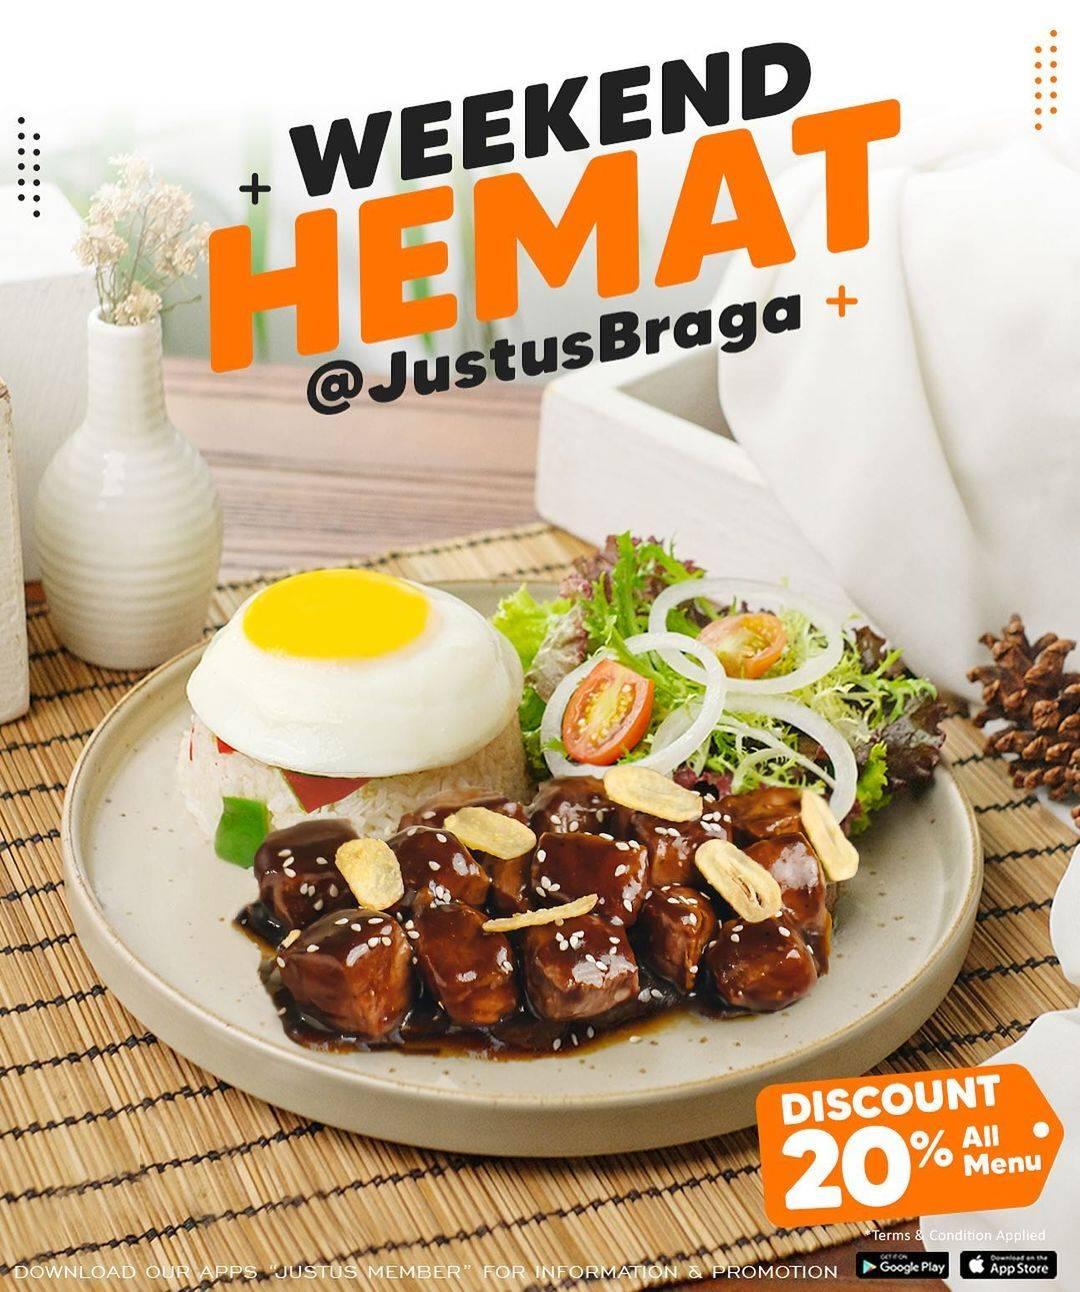 Diskon Just Us Burger Steak Discount 20% Off On All Menu